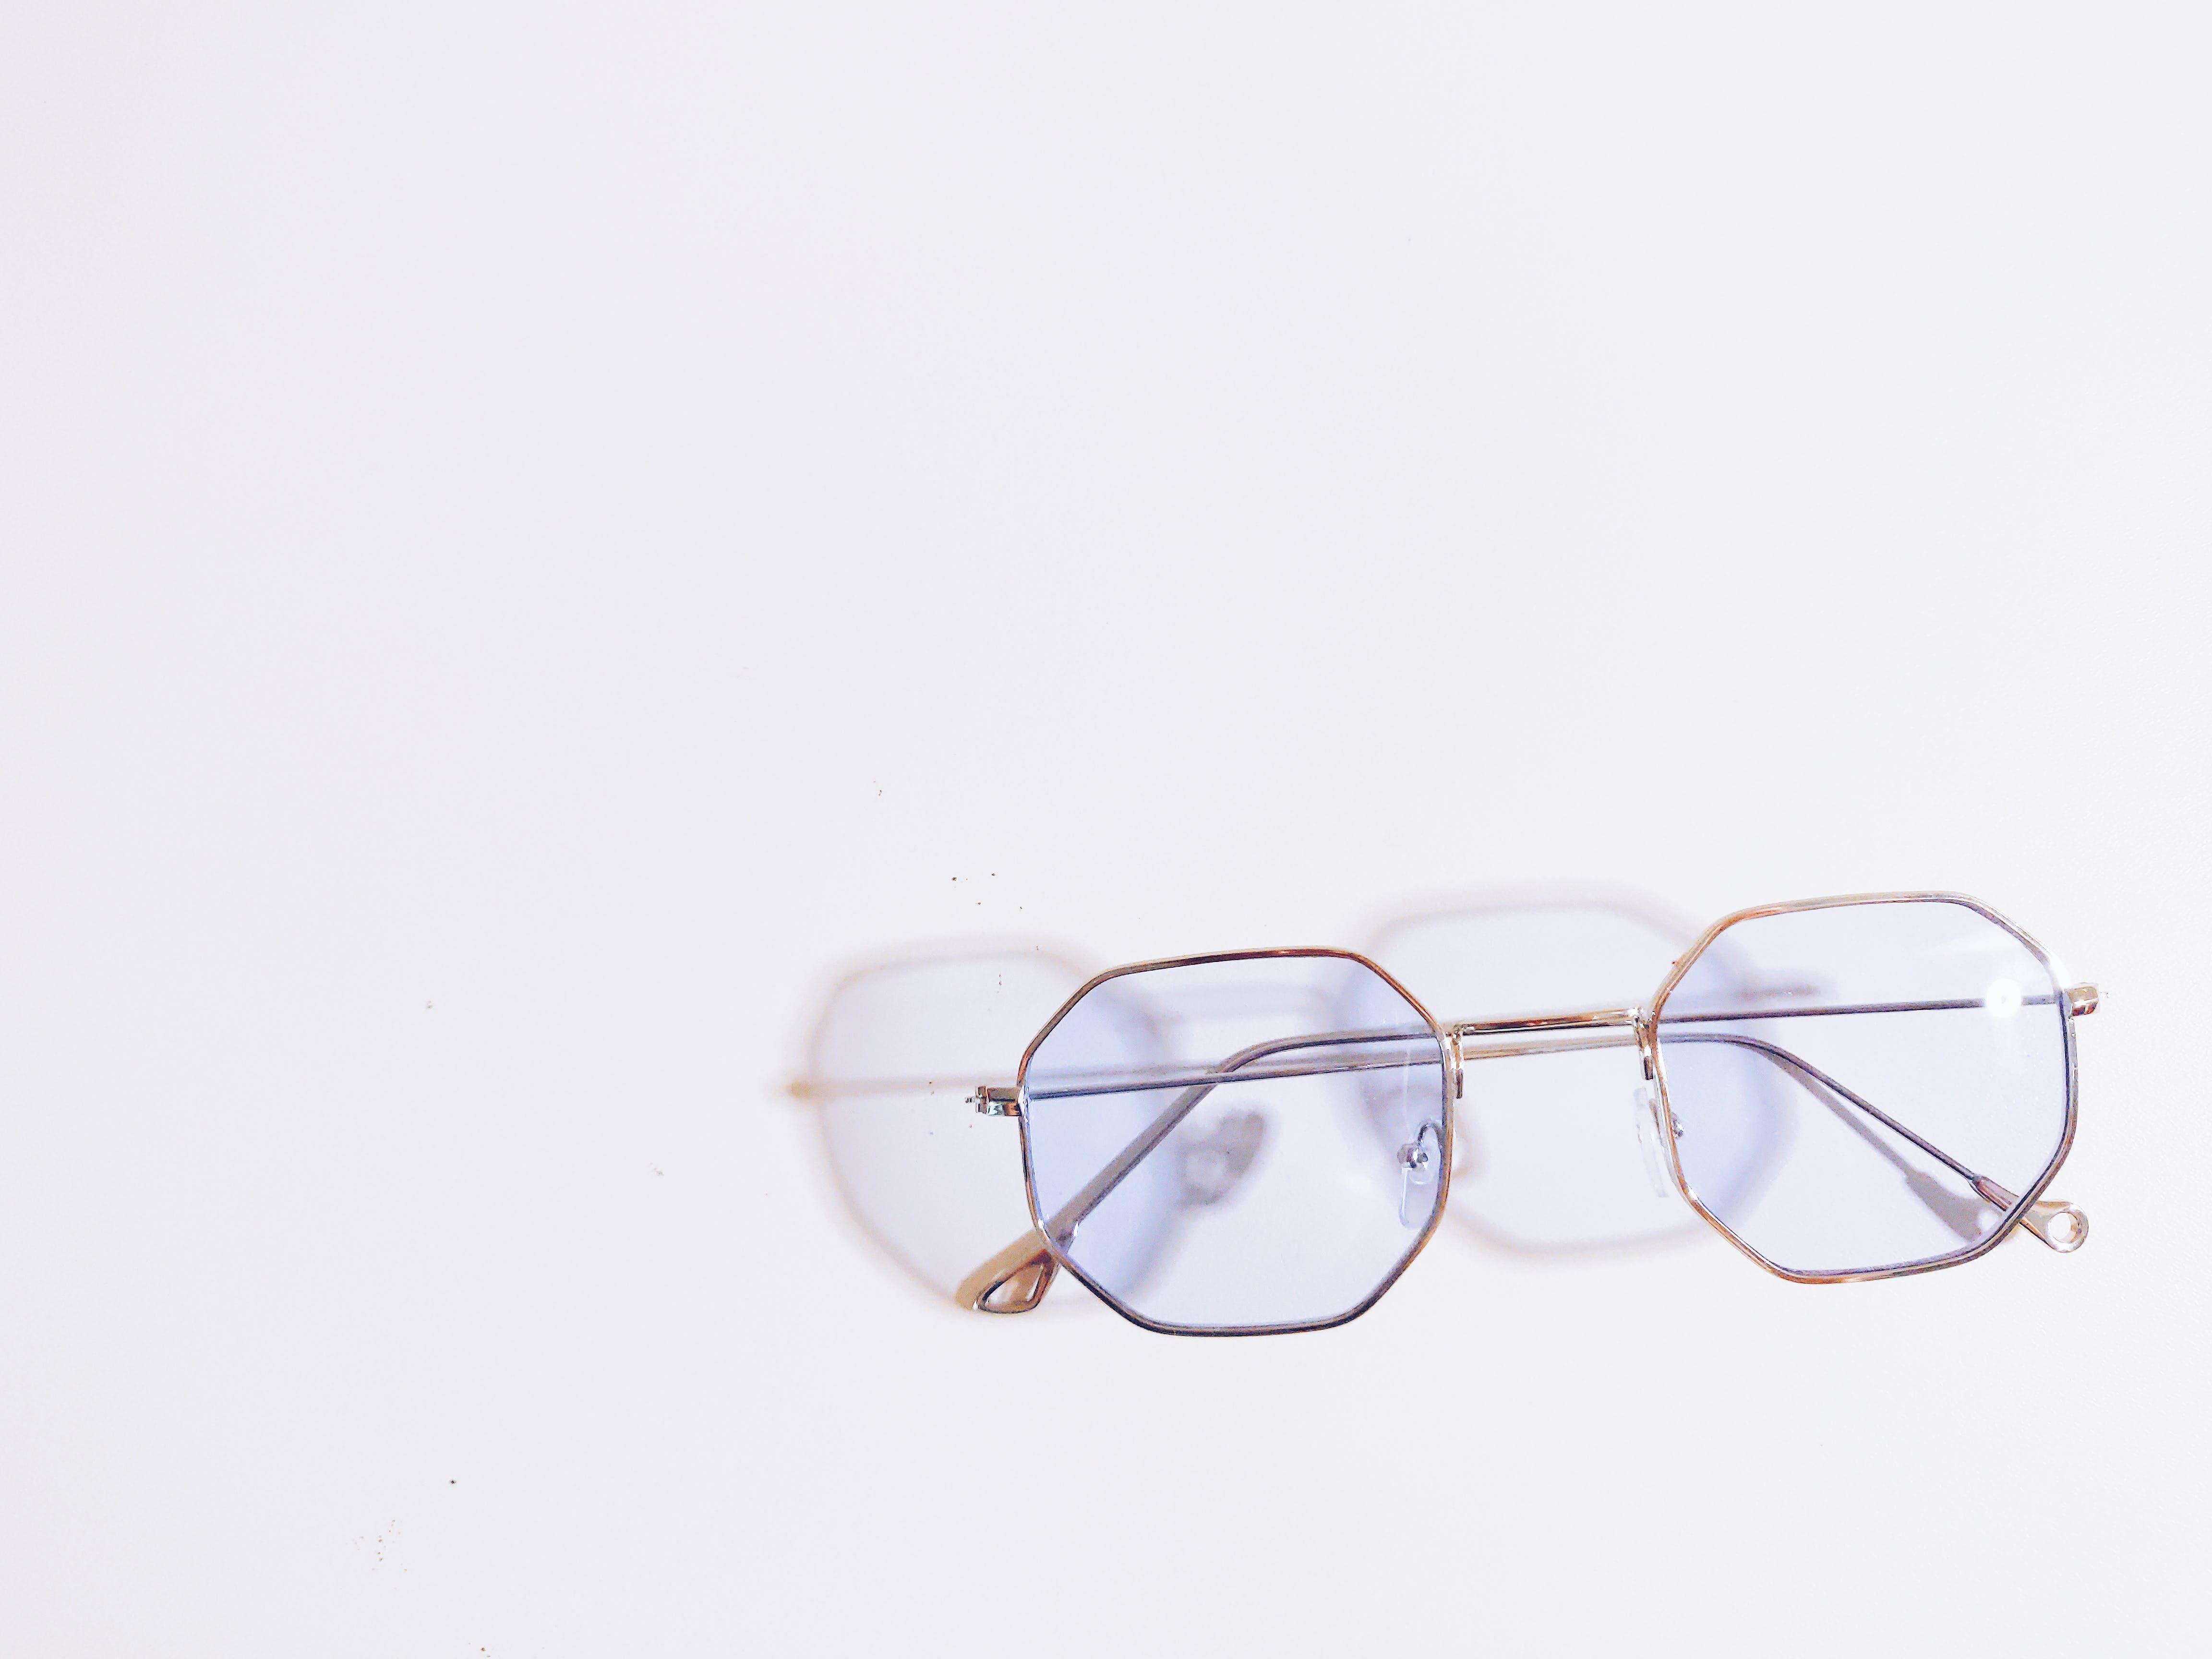 Eyeglasses With White Background